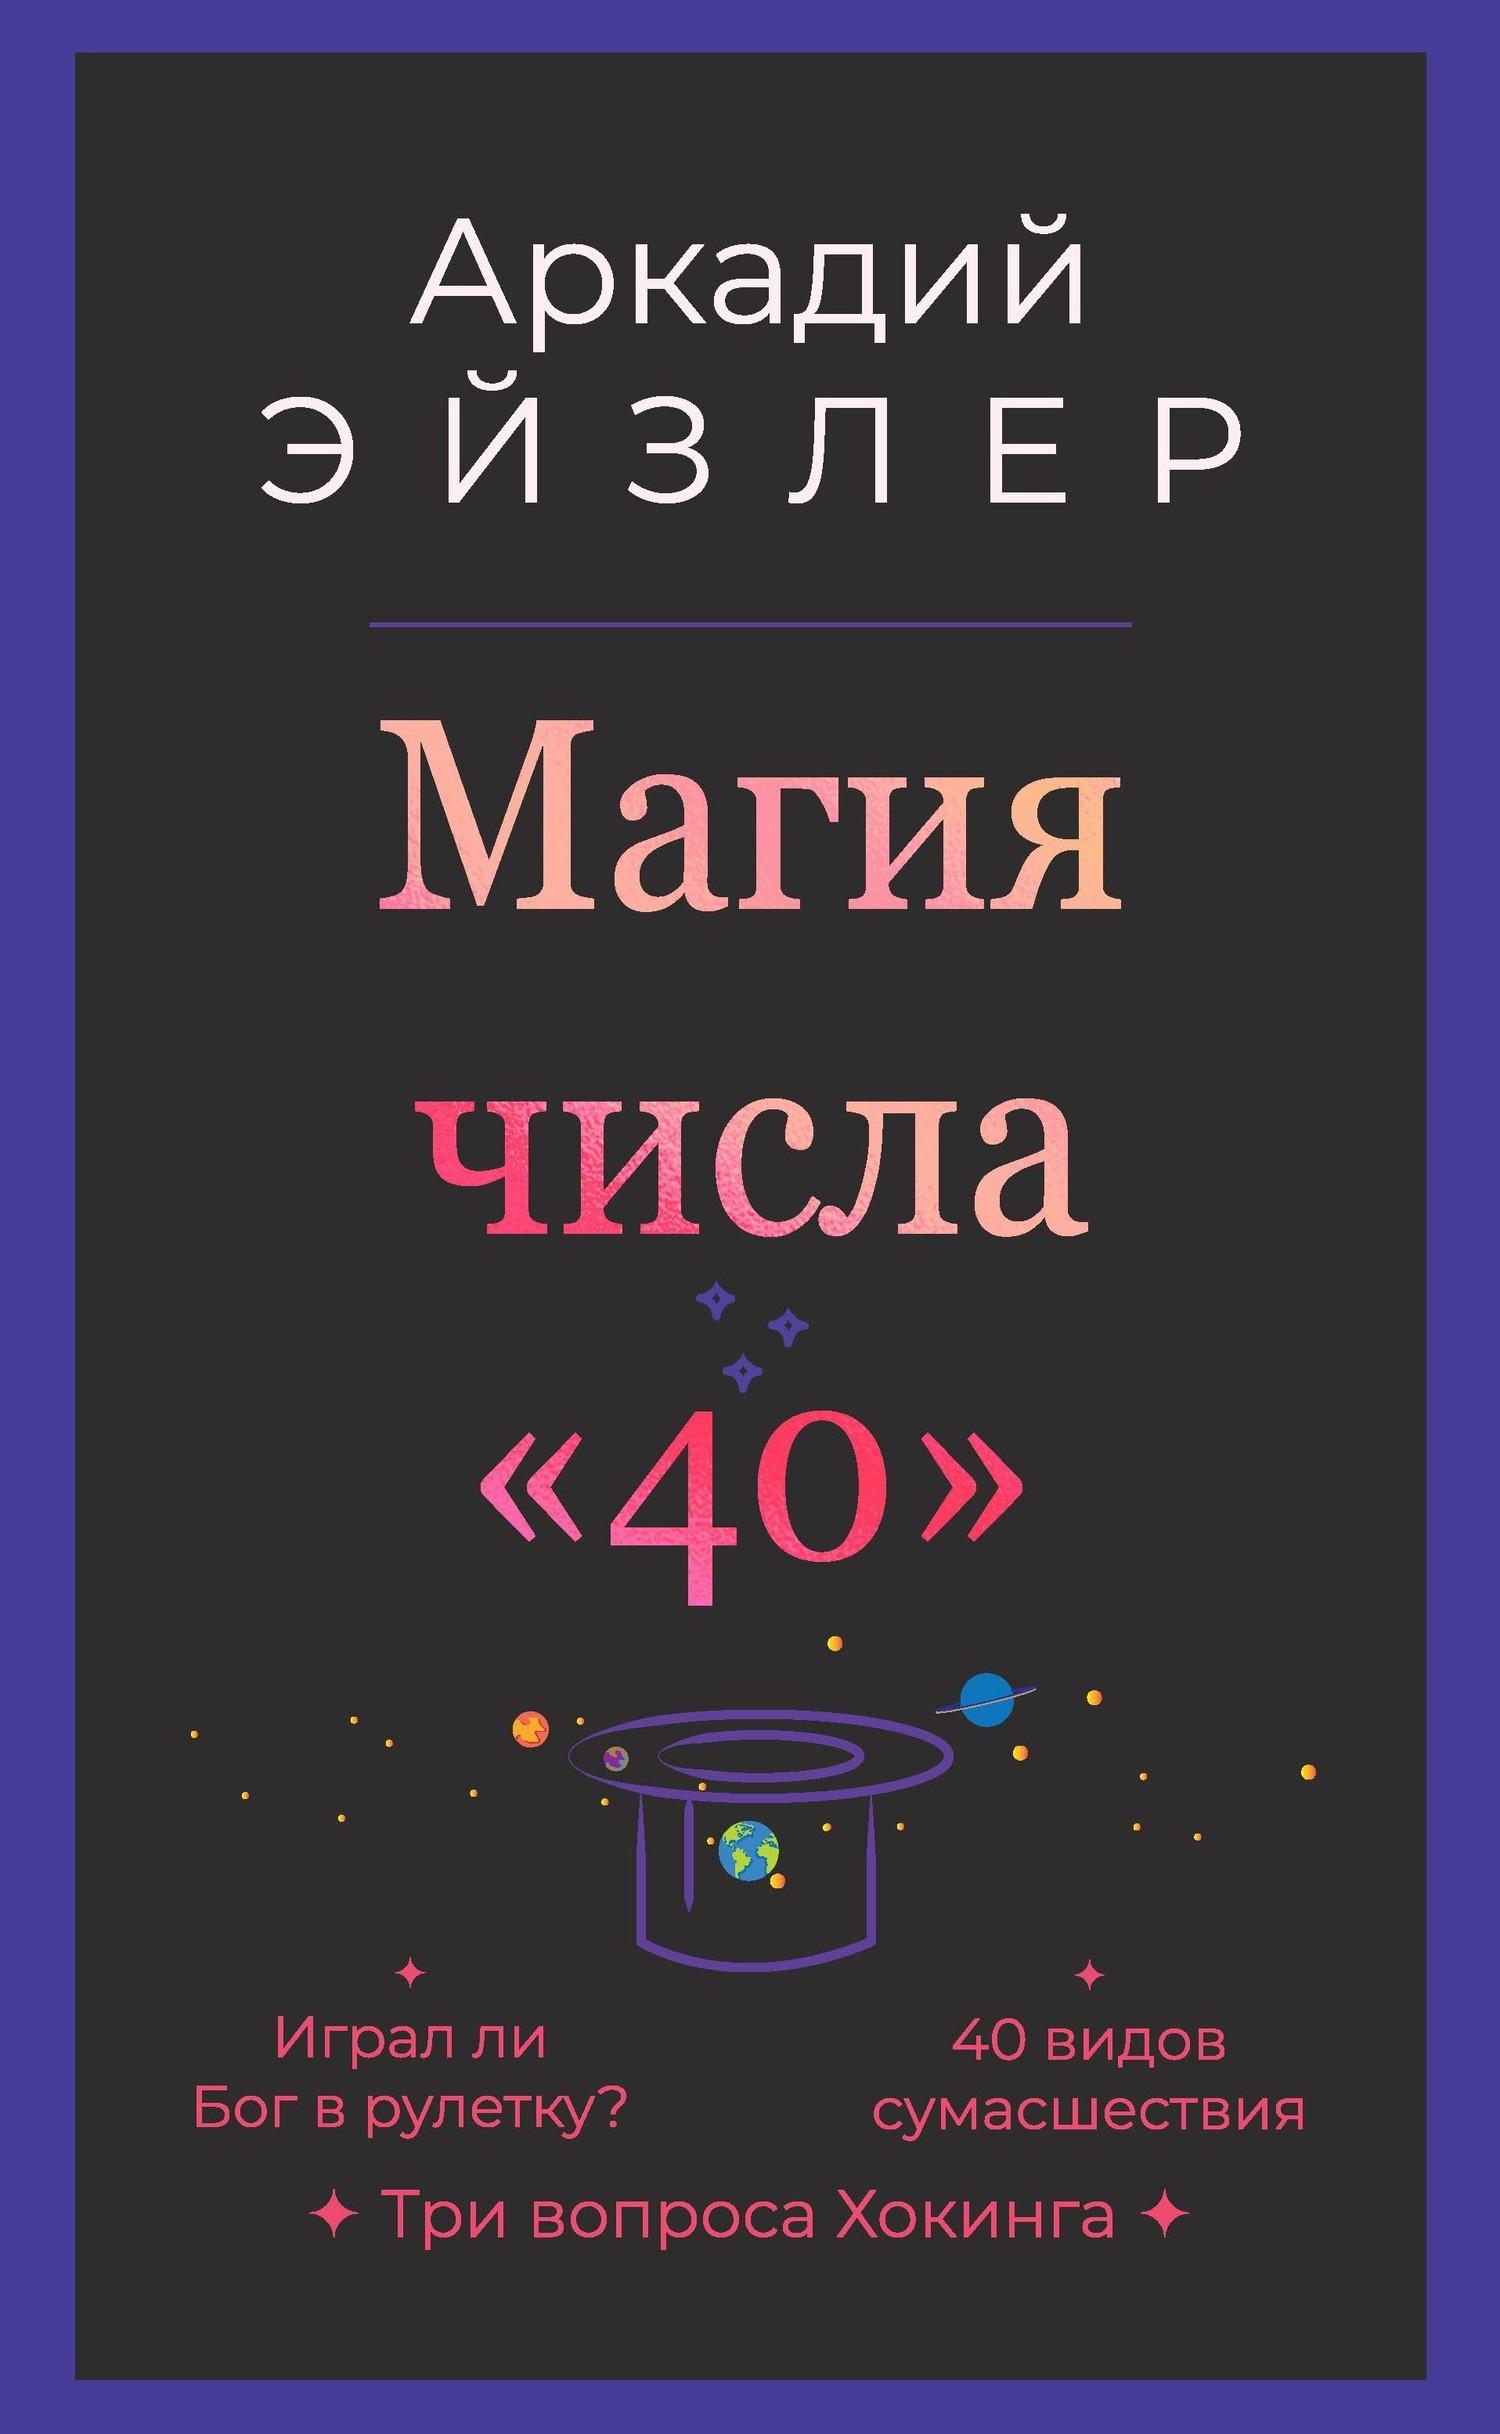 Аркадий Эйзлер - Магия числа «40»